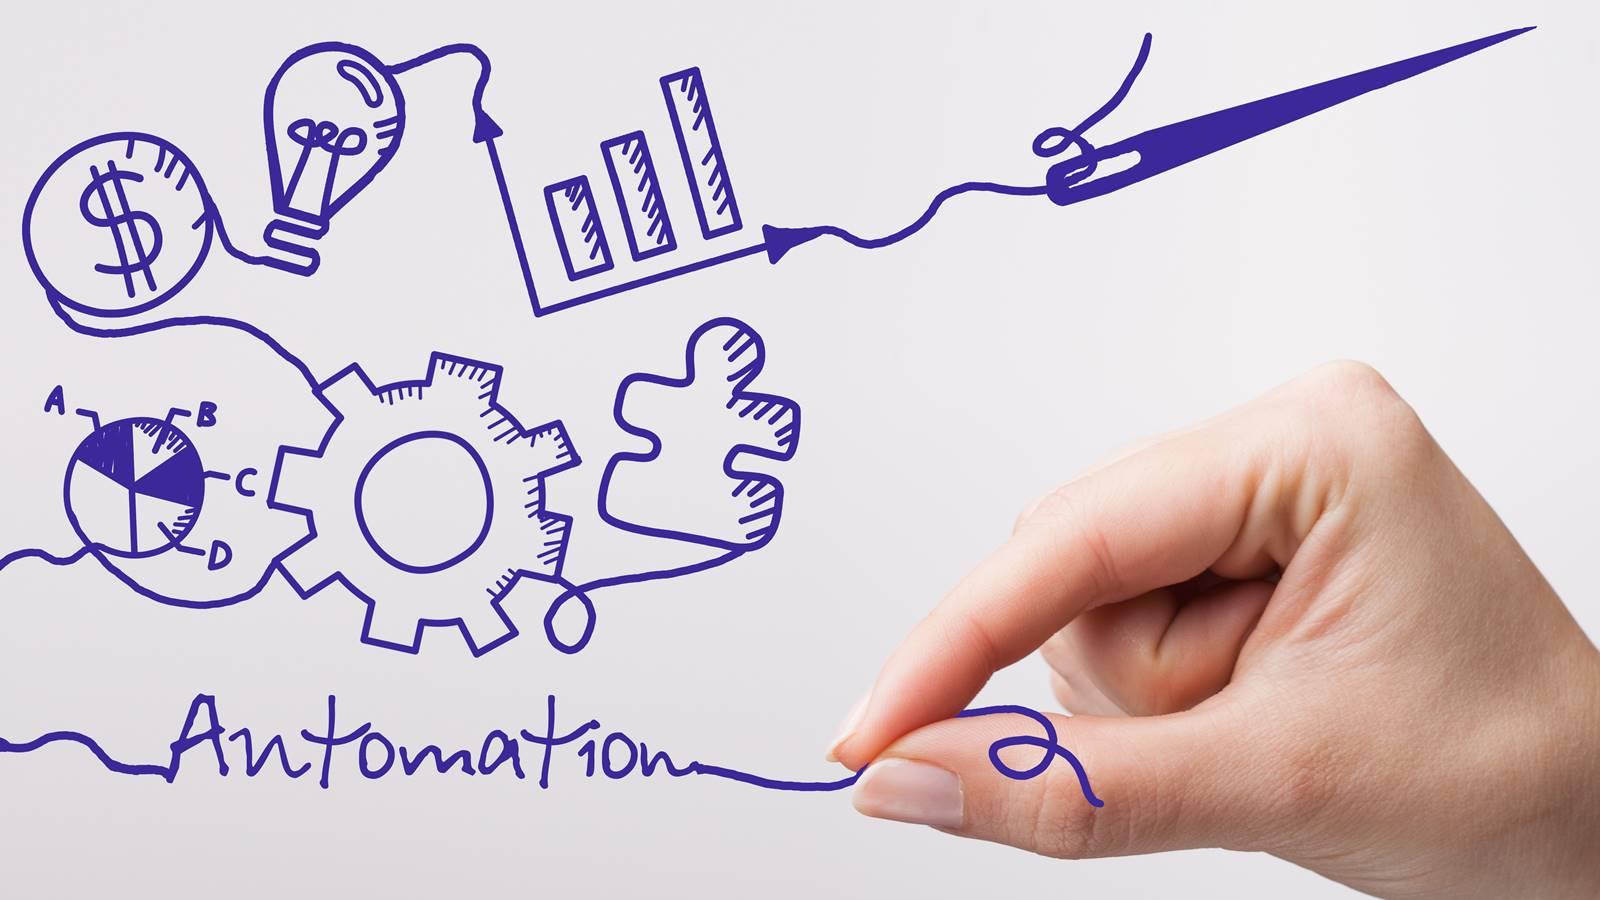 Marketing Automation Turns Life-Saver for Start-ups